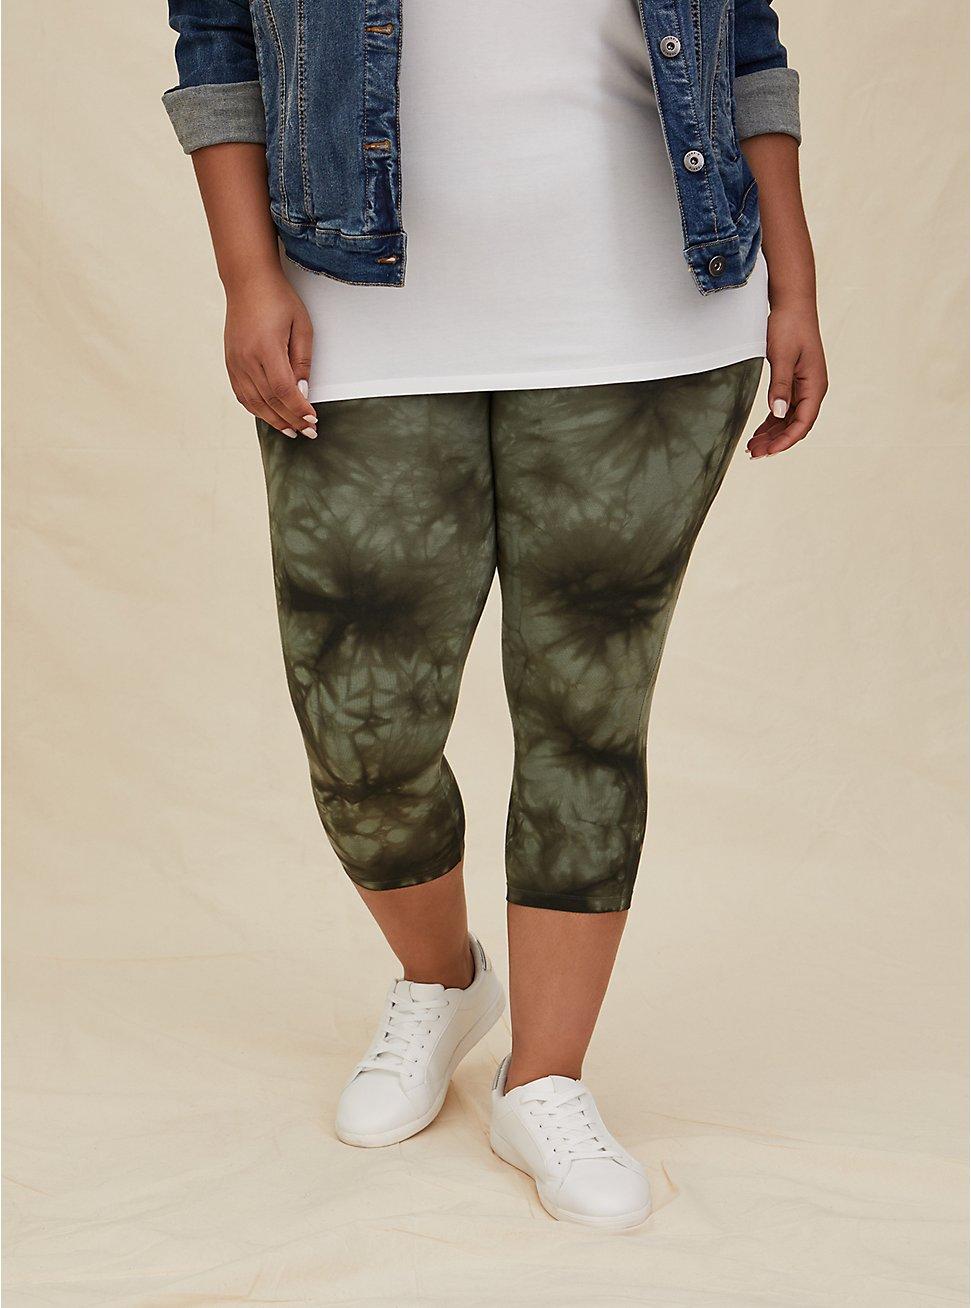 Capri Premium Legging - Tie-Dye Olive Green, GREEN, hi-res